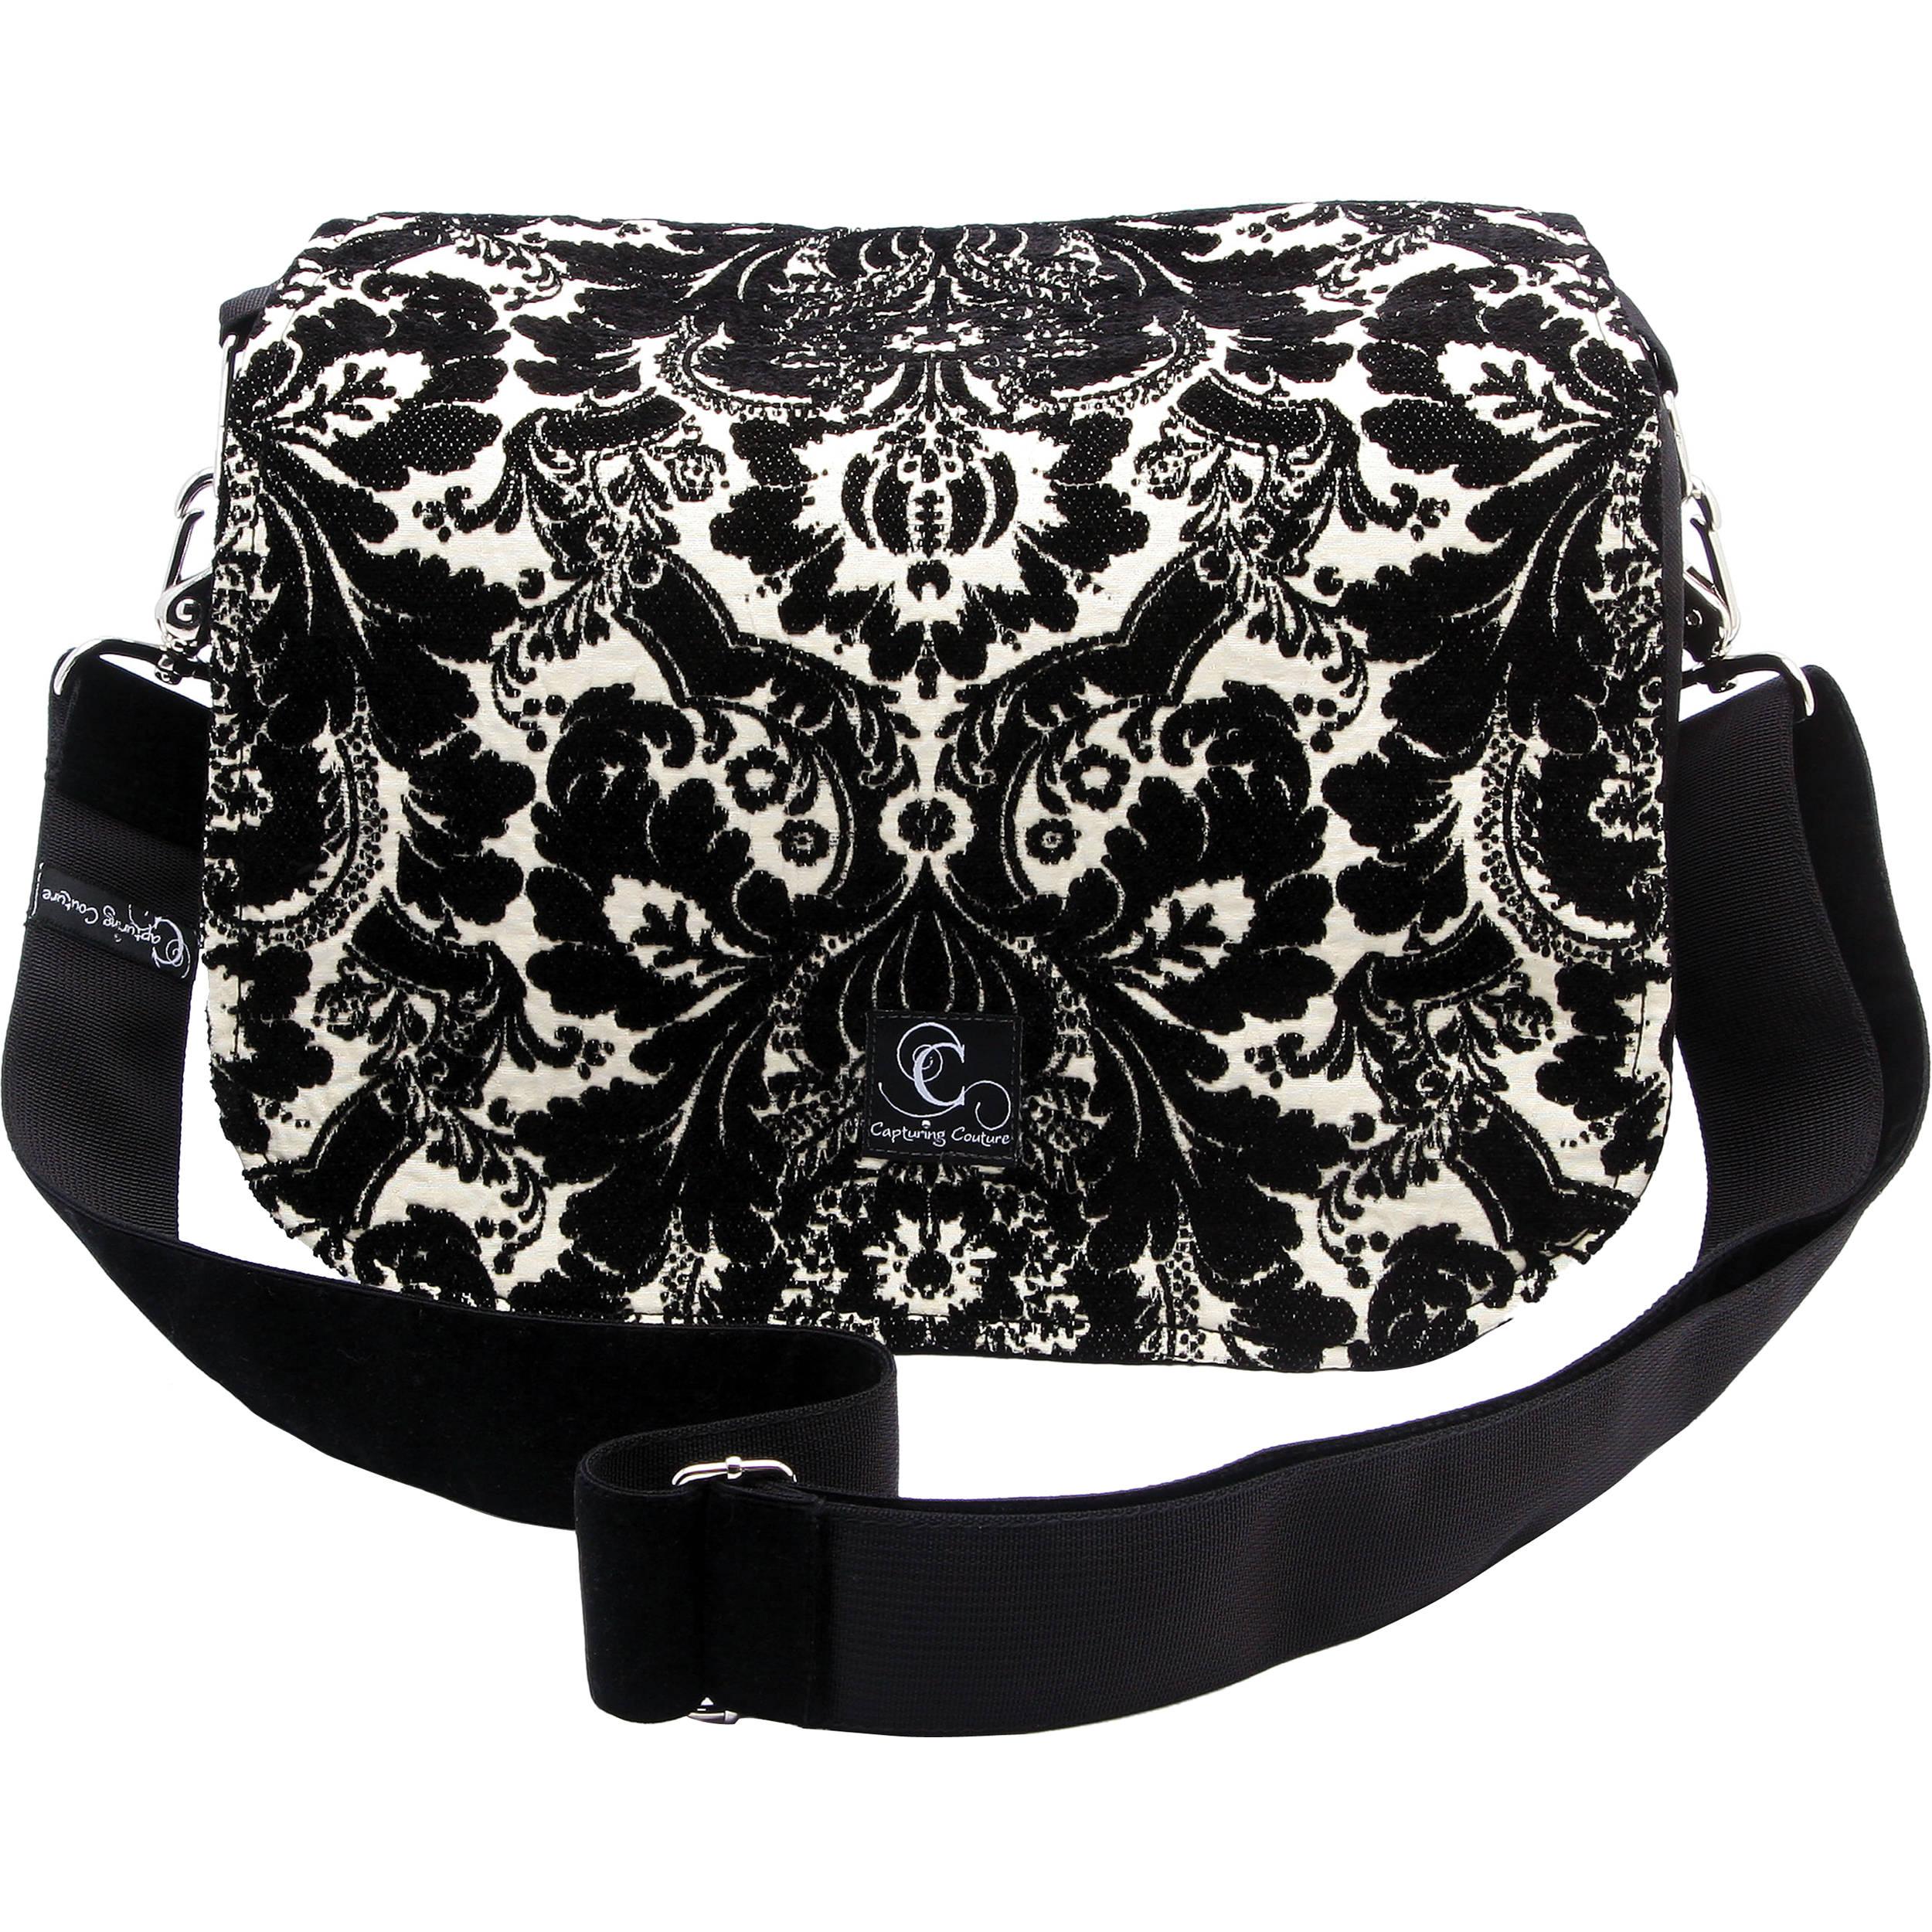 Navajo Black Capturing Couture Camera Bag Limited Edition